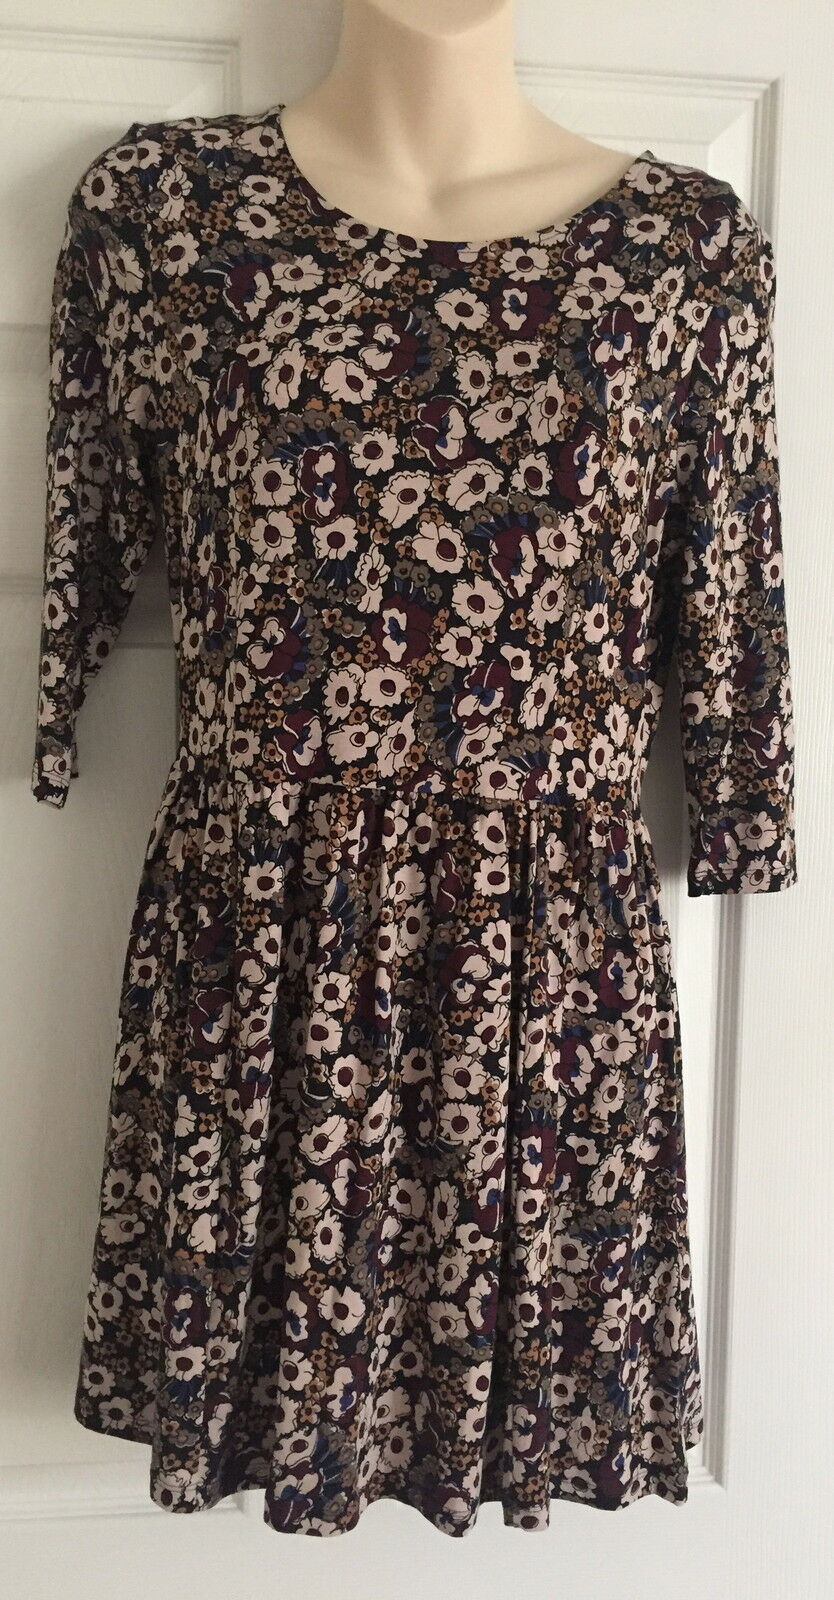 EX BNWT Marks & Spencer PETITE EXCLUSIVE  UK14P , 16P  DRESSES